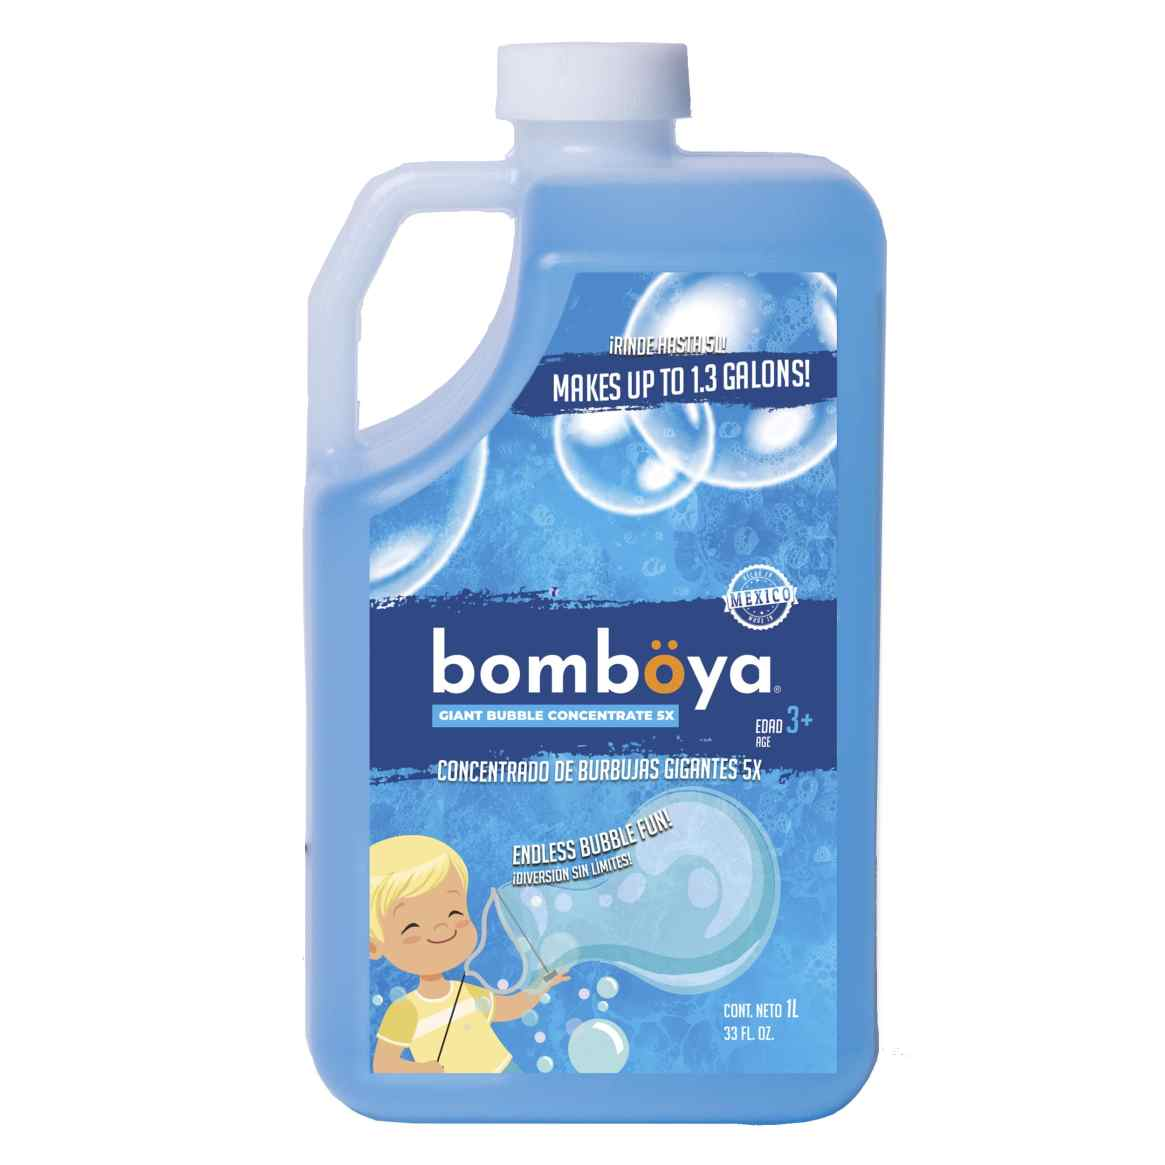 mezcla-de-burbujas-gigantes-Concentrado-5x-min